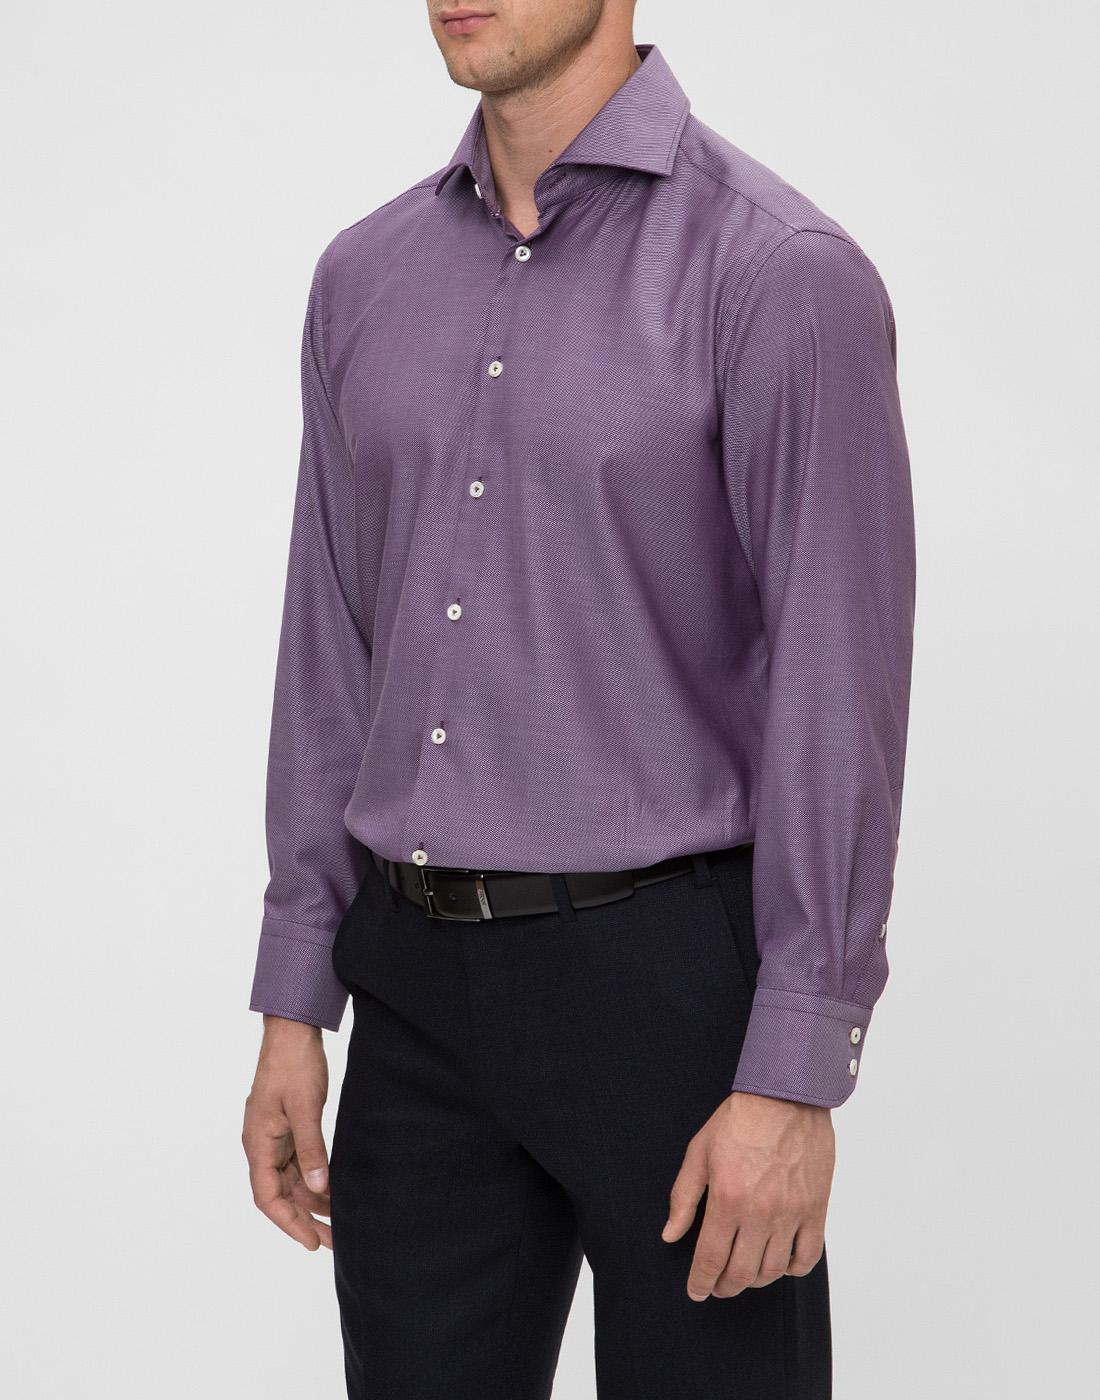 Мужская сиреневая рубашка Van Laack S151377/670-3